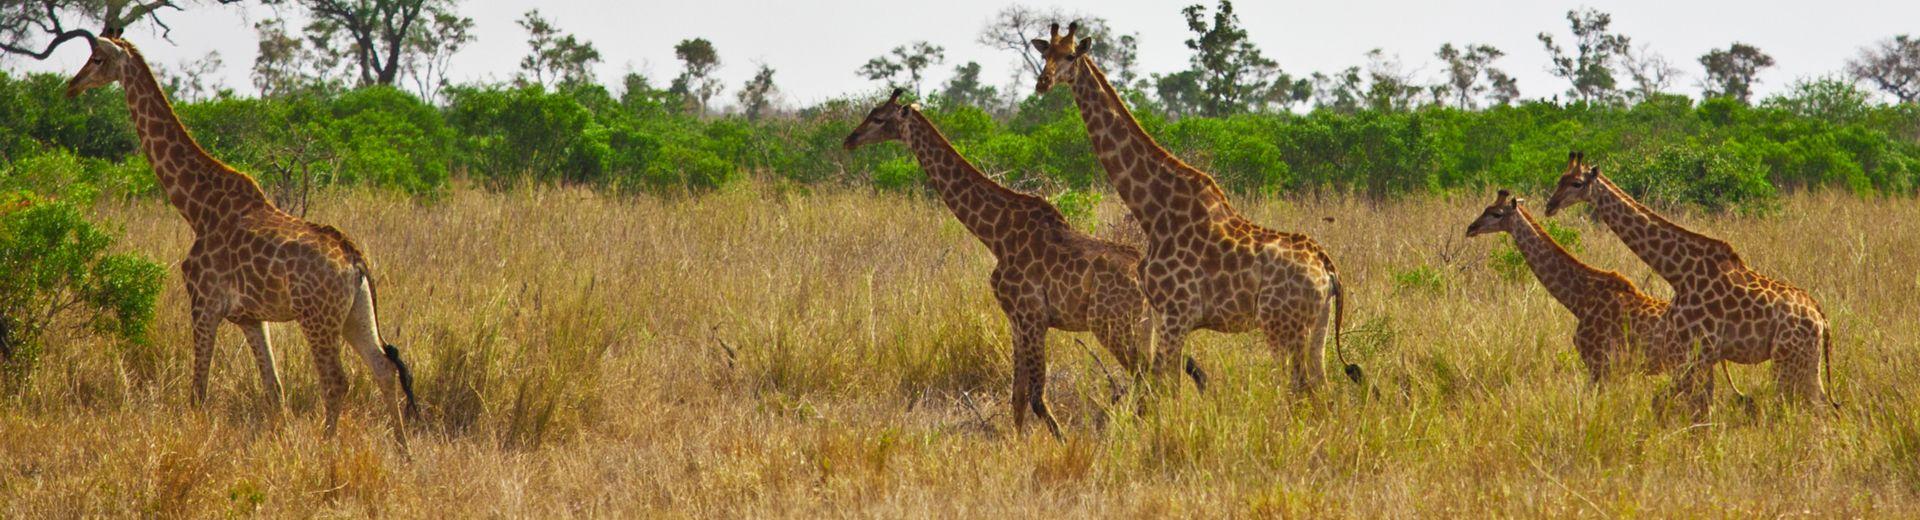 AIDAmira: Südafrika und Namibia entdecken